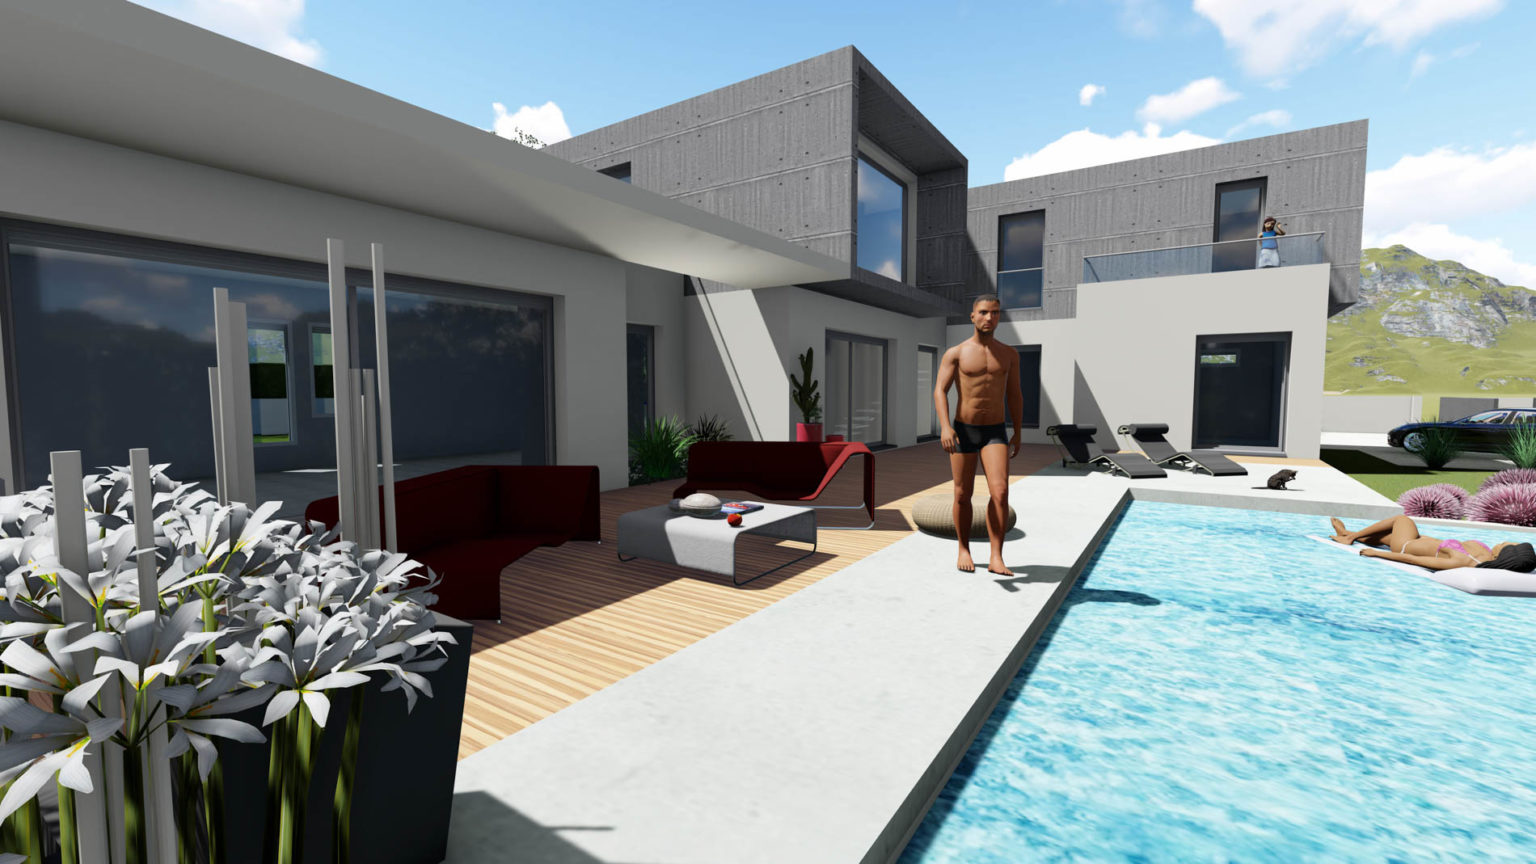 villa-contemporaine-krim-02